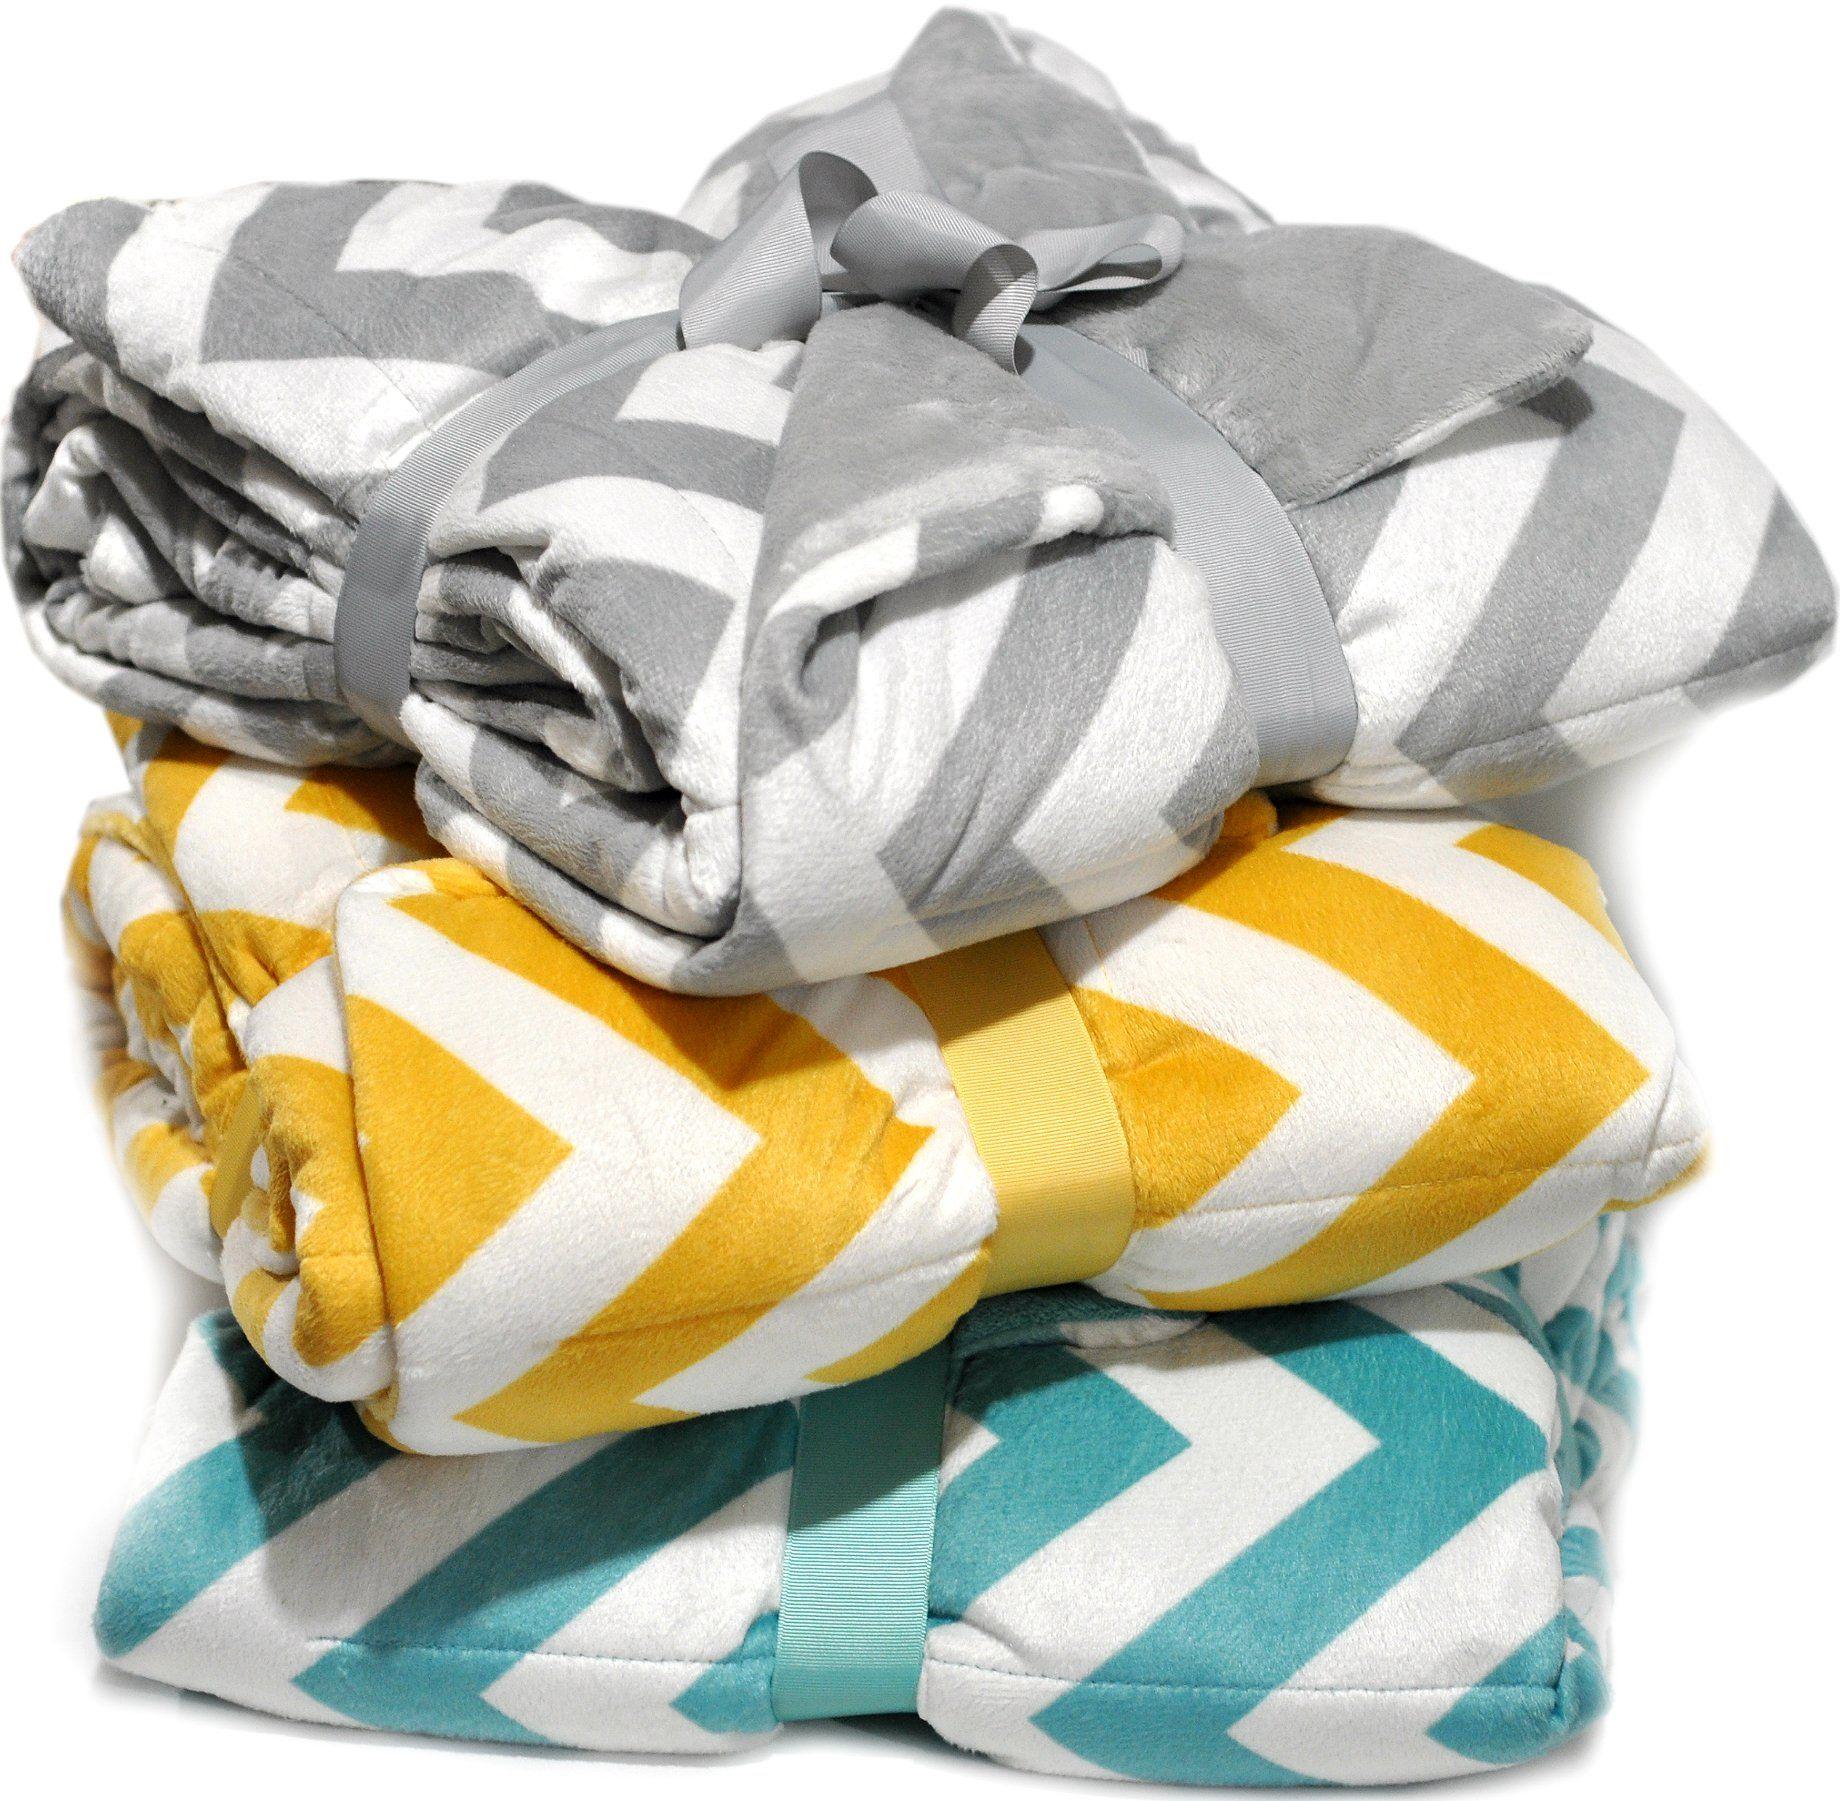 Plush Chevron Quilted Throw Super Soft Velvet Reversible Oversized ... : quilt throw blanket - Adamdwight.com